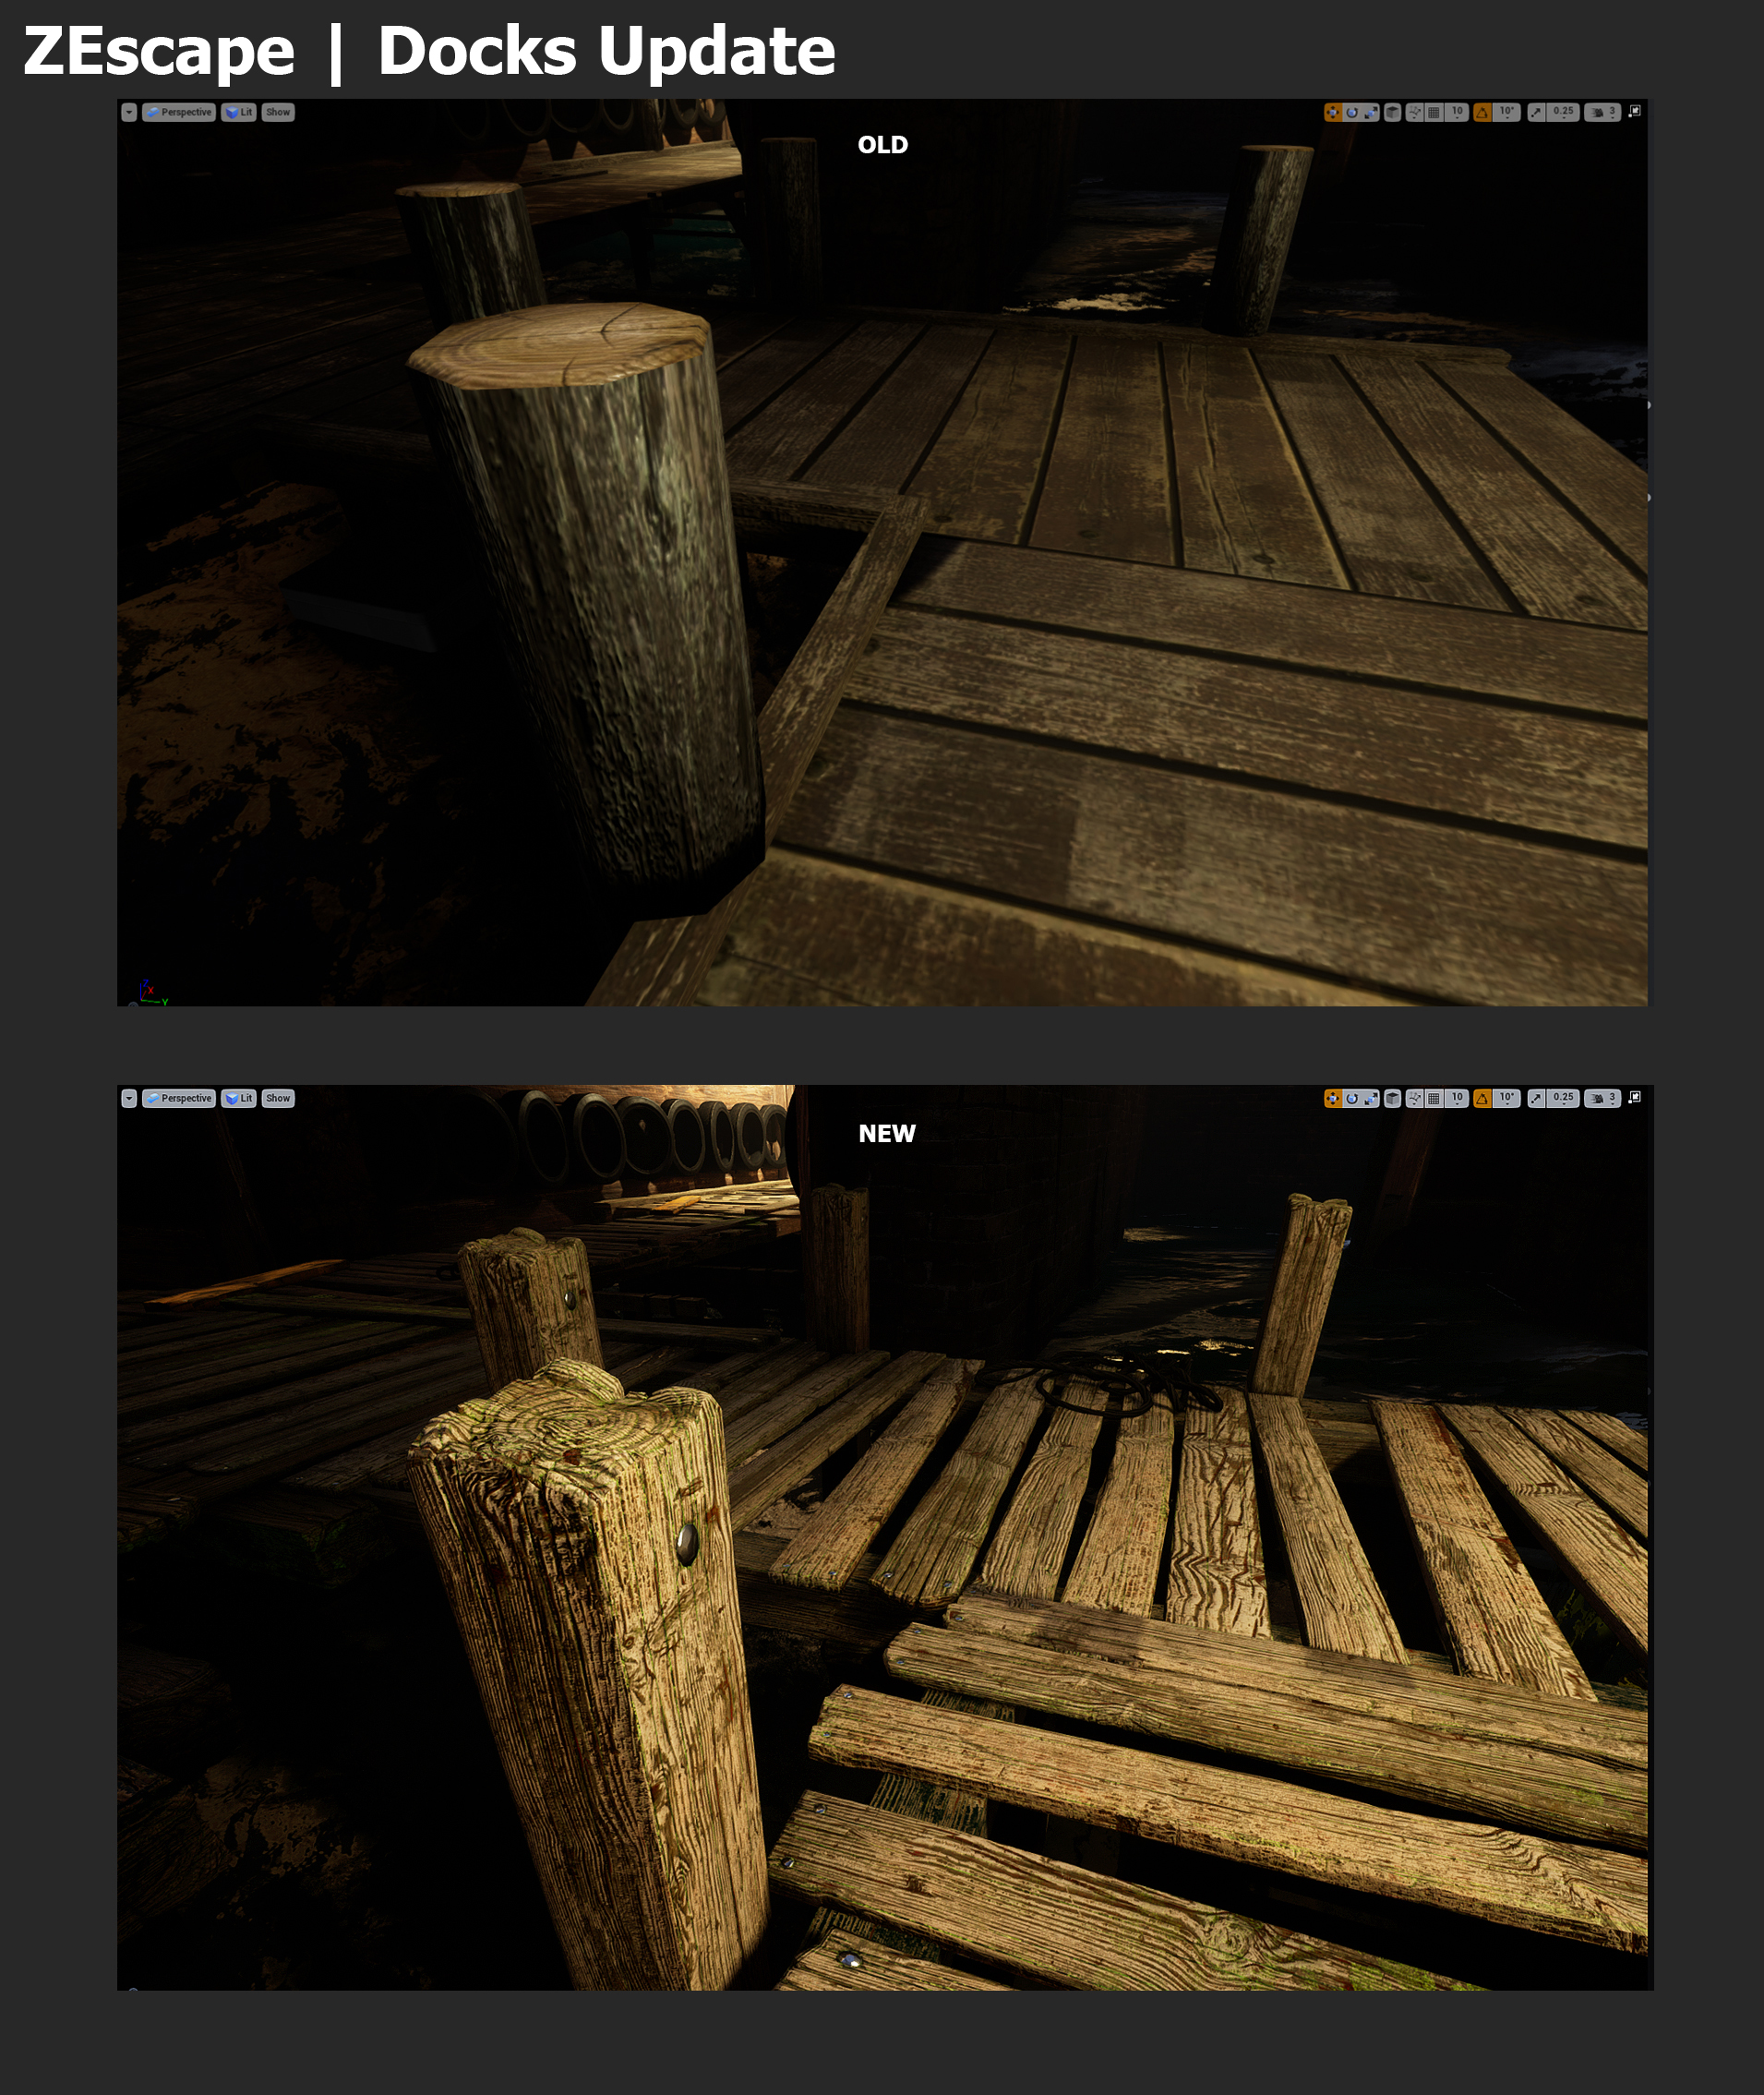 docks update0